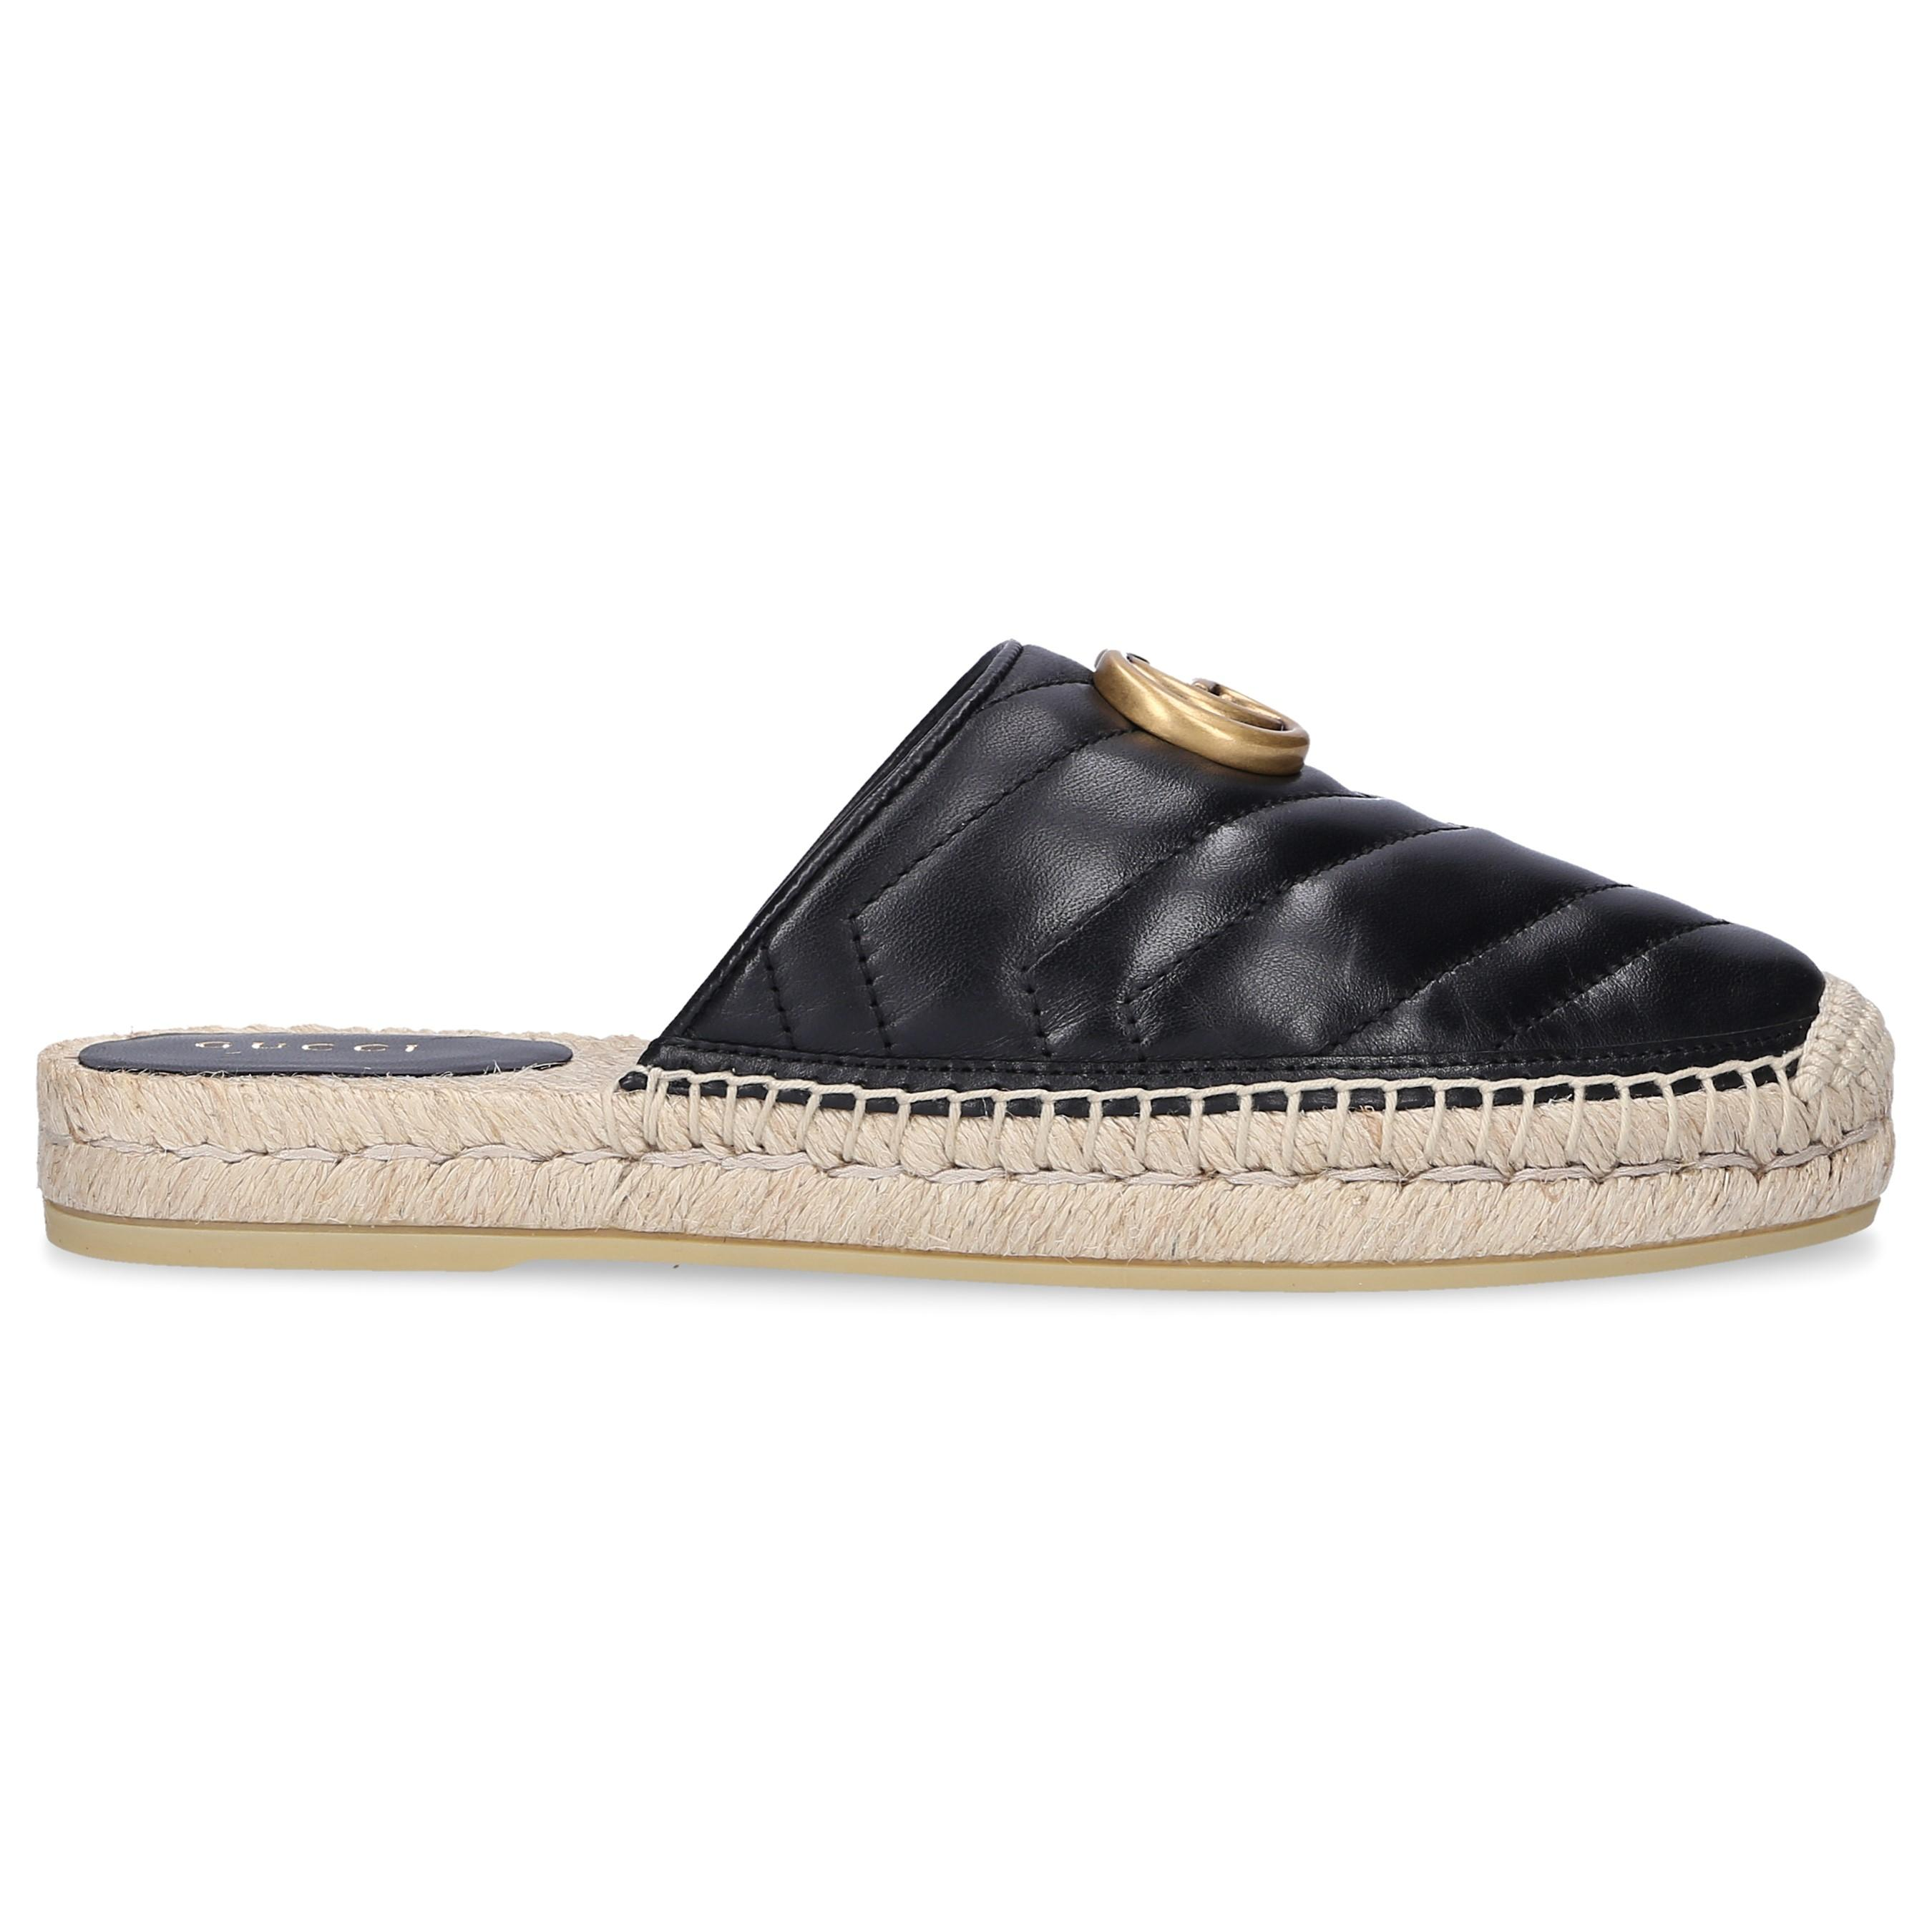 64e35c2a0 Gucci - Black Slip On Shoes Bko00 - Lyst. View fullscreen